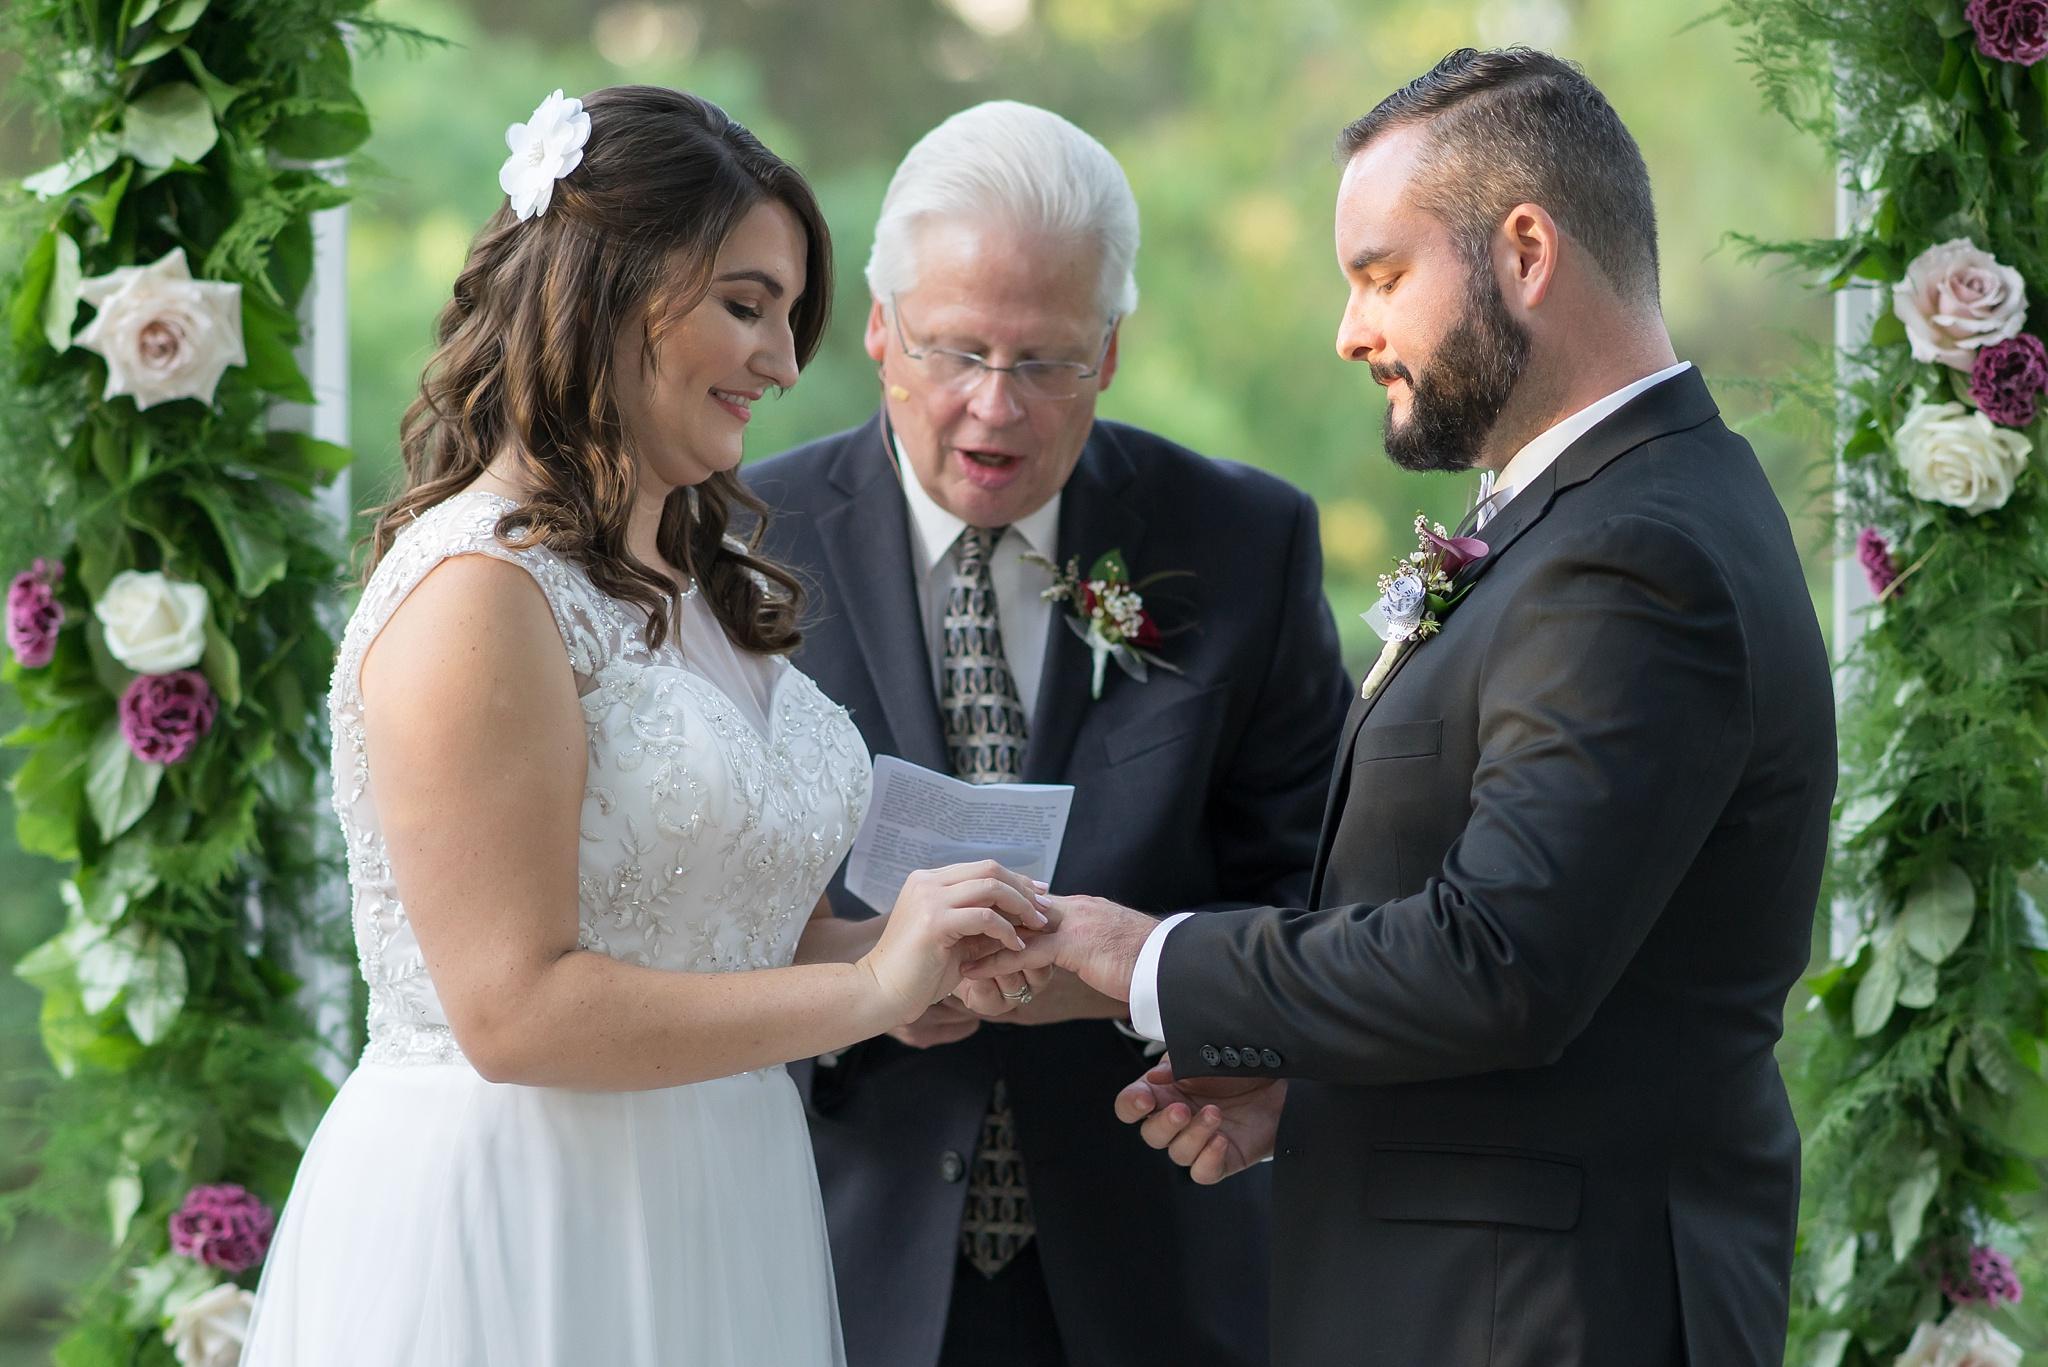 TommyandAmanda_WEDDING_BrienneMichelle_Ceremony_079_BLOG.jpg